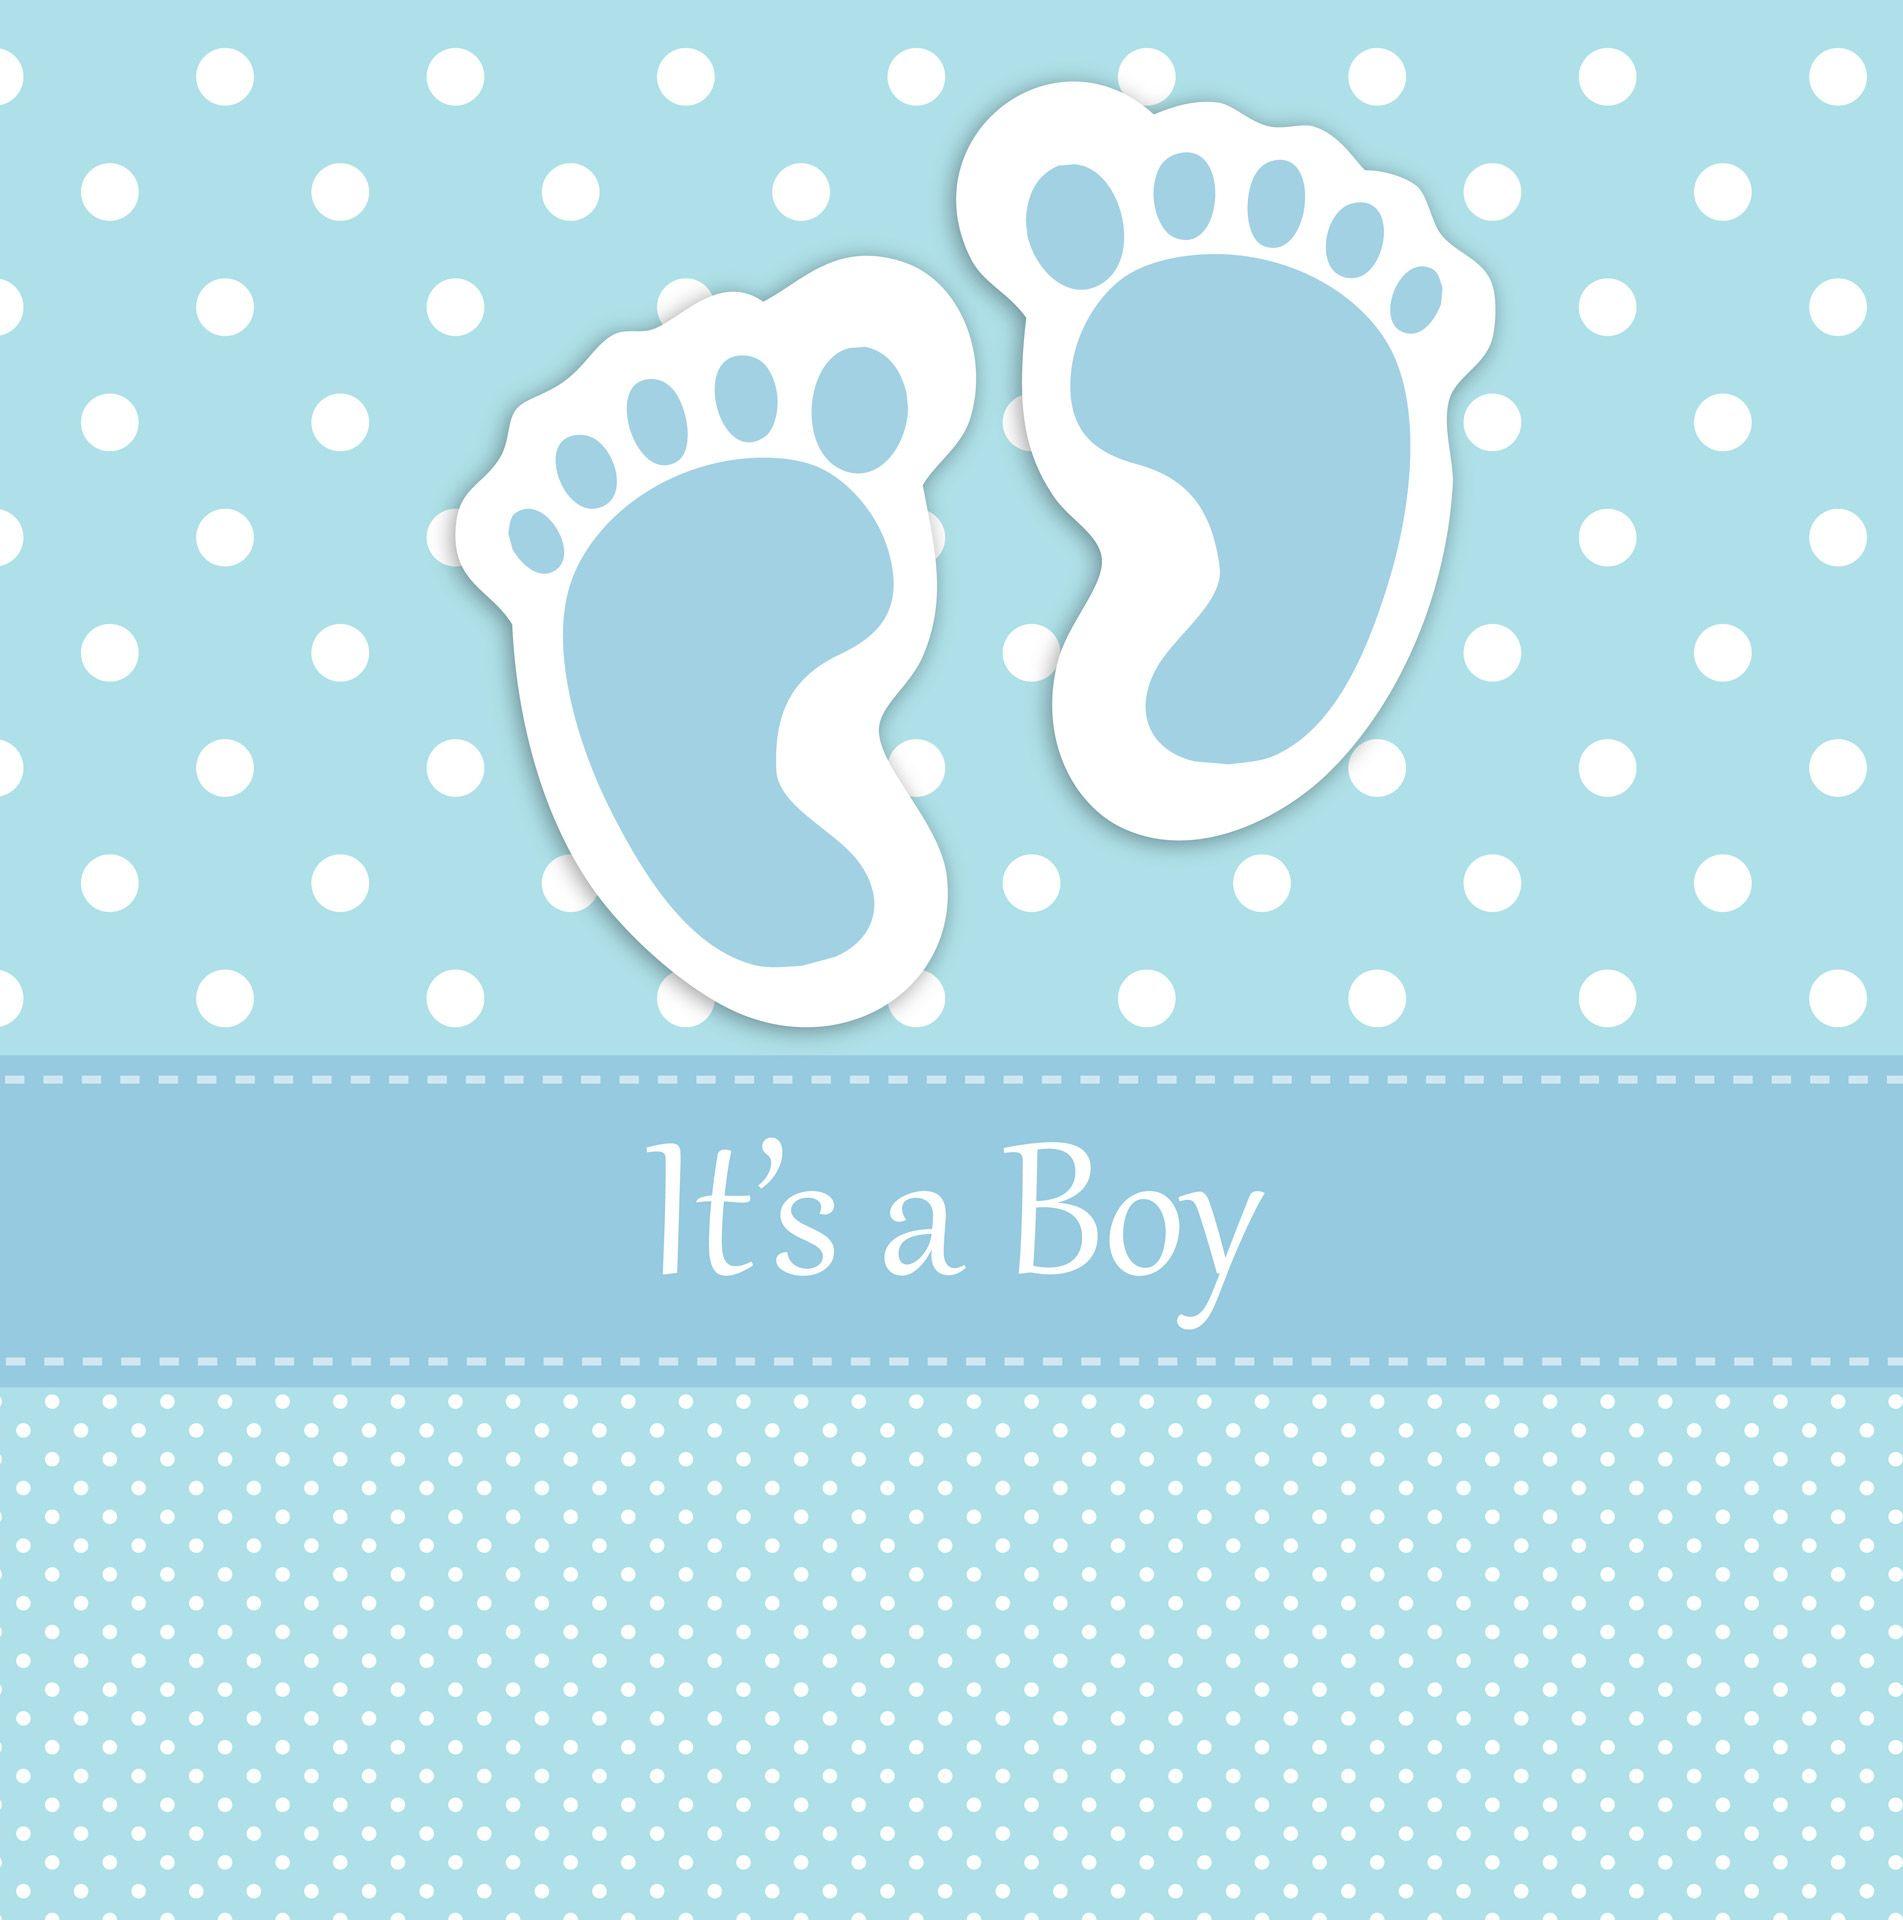 Huellas del beb tarjeta etiket pinterest babies baby cards blue polka dots baby boy footprints card template for scrapbooking voltagebd Image collections